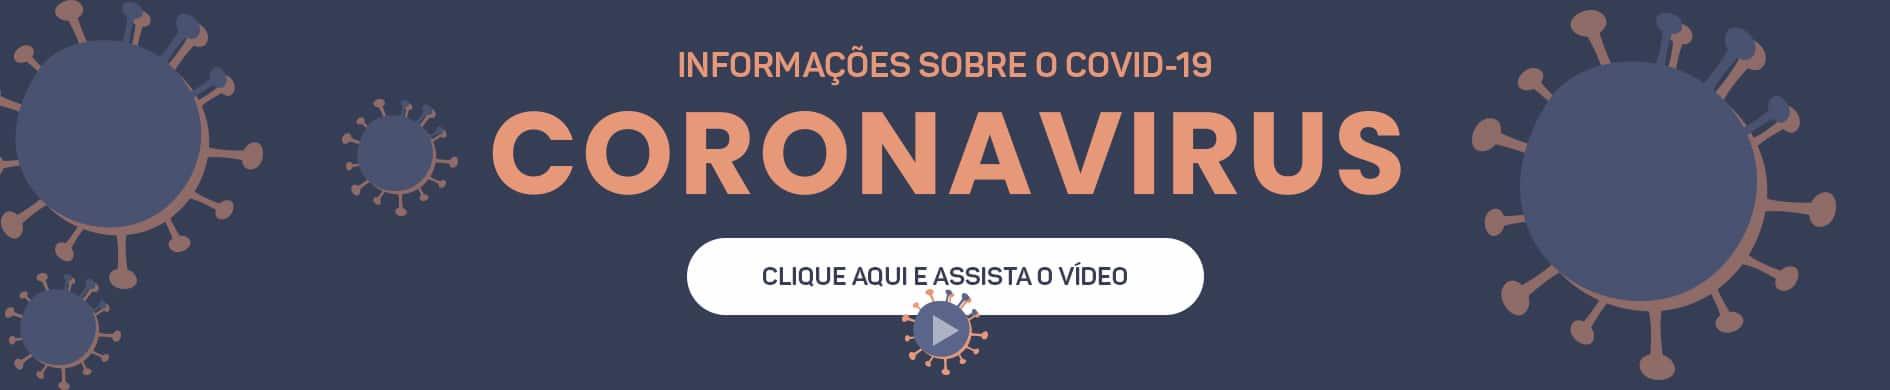 banner-covid-19